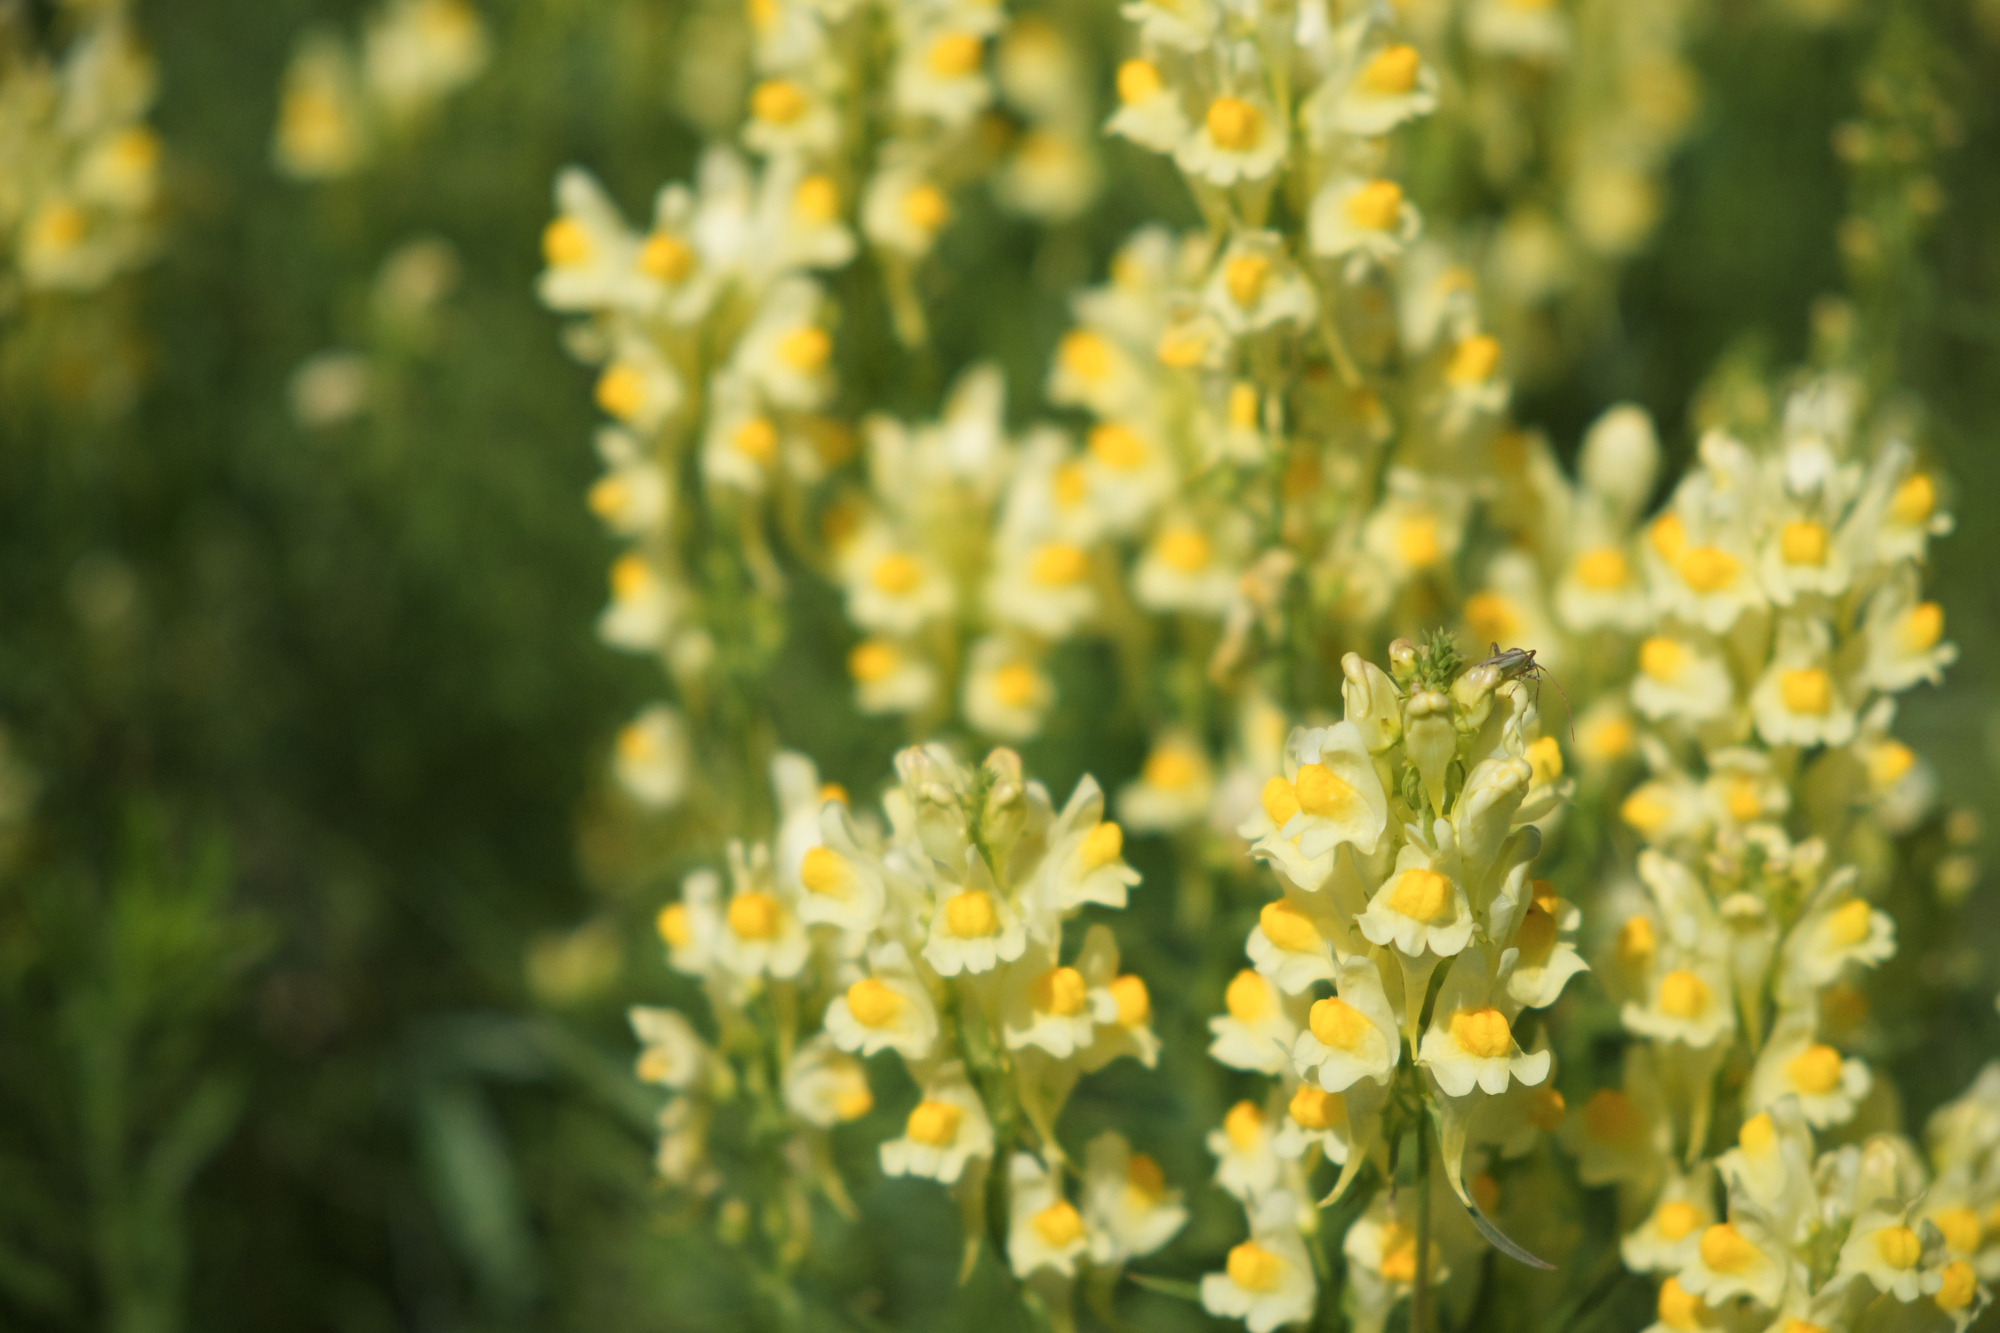 Flaxseed or wild snapdragon (Linaria vulgaris) is a medicinal herb.